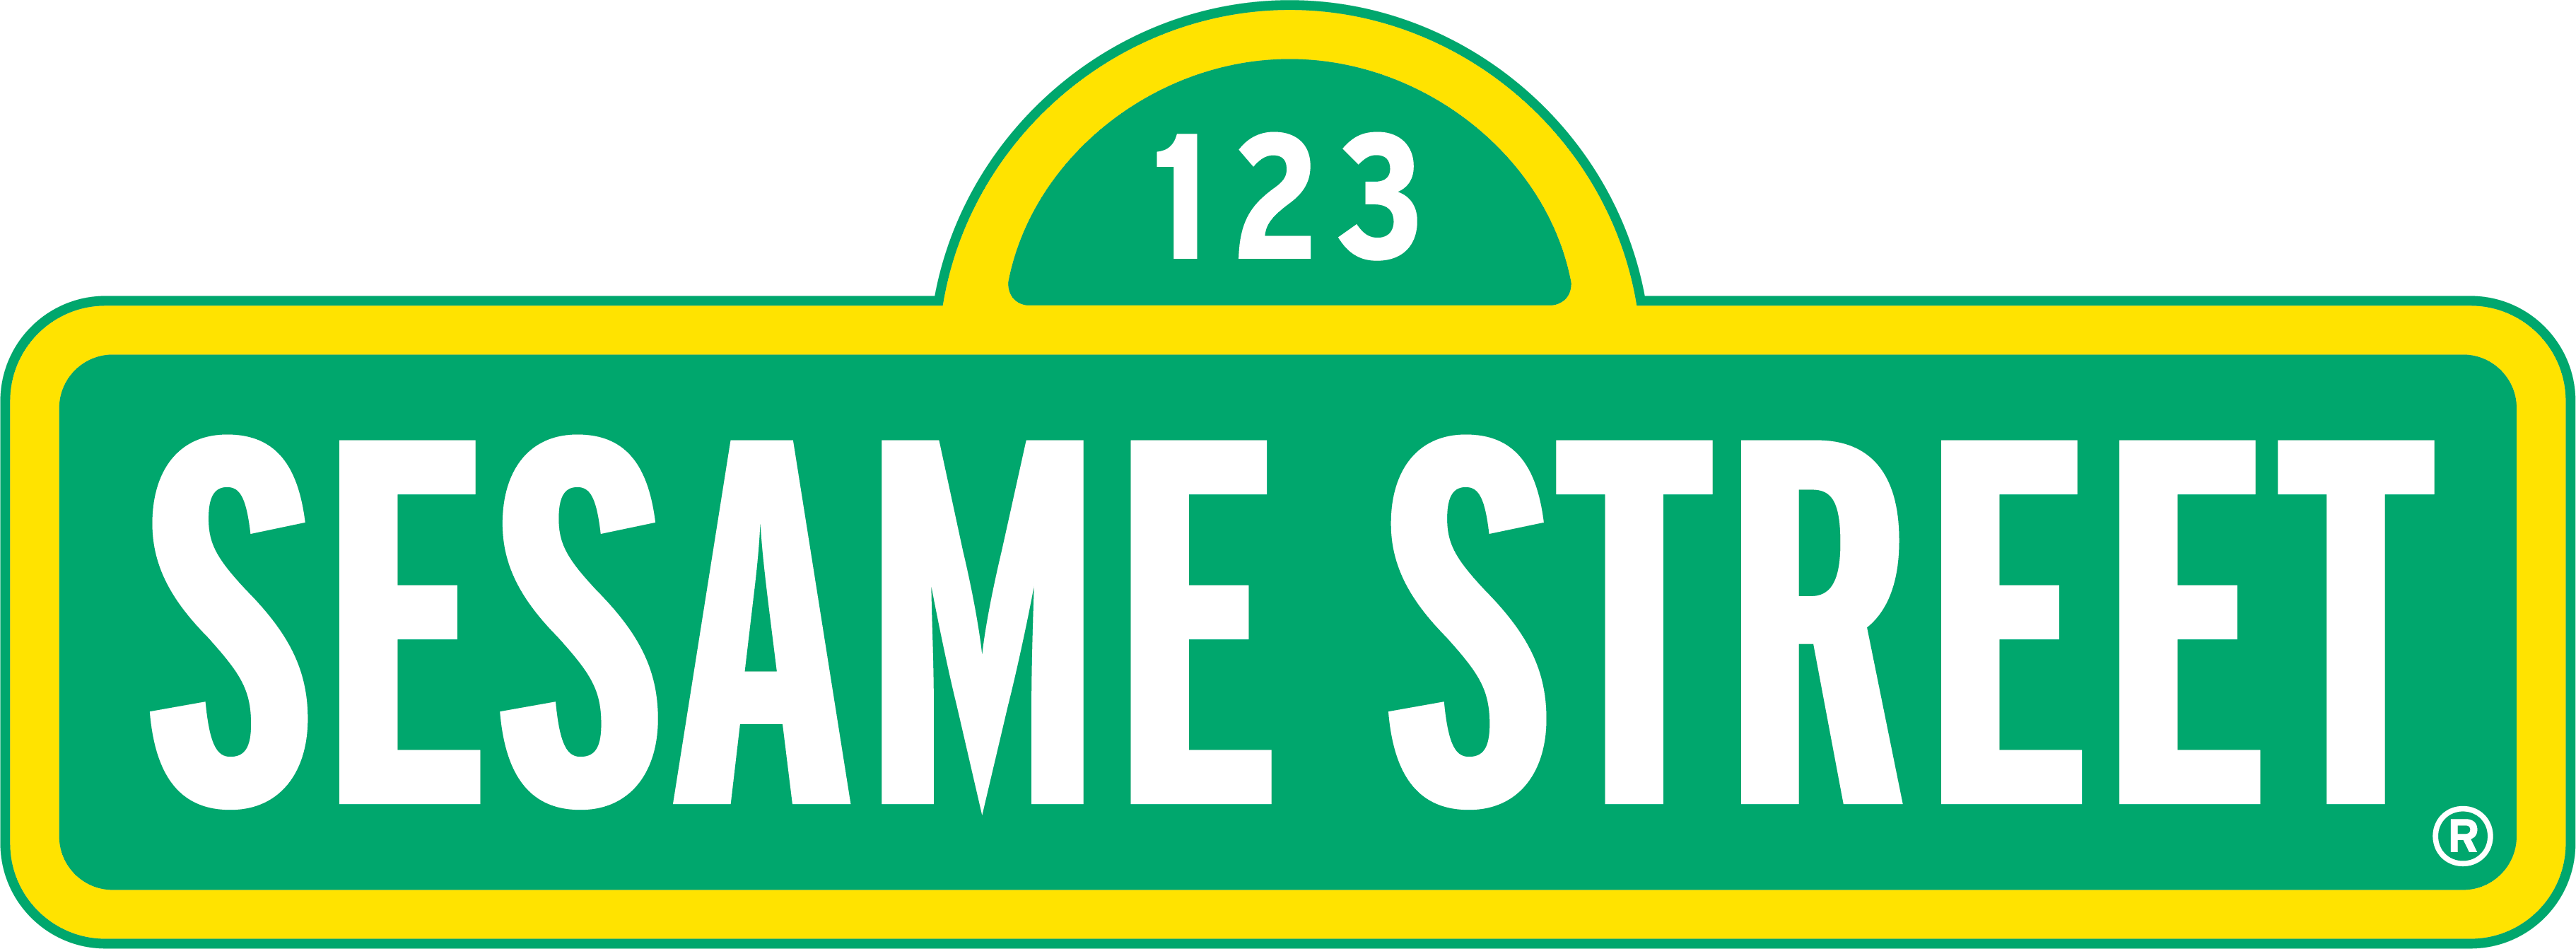 Throwback Thursday: Sesame Street - Pinball Number Count